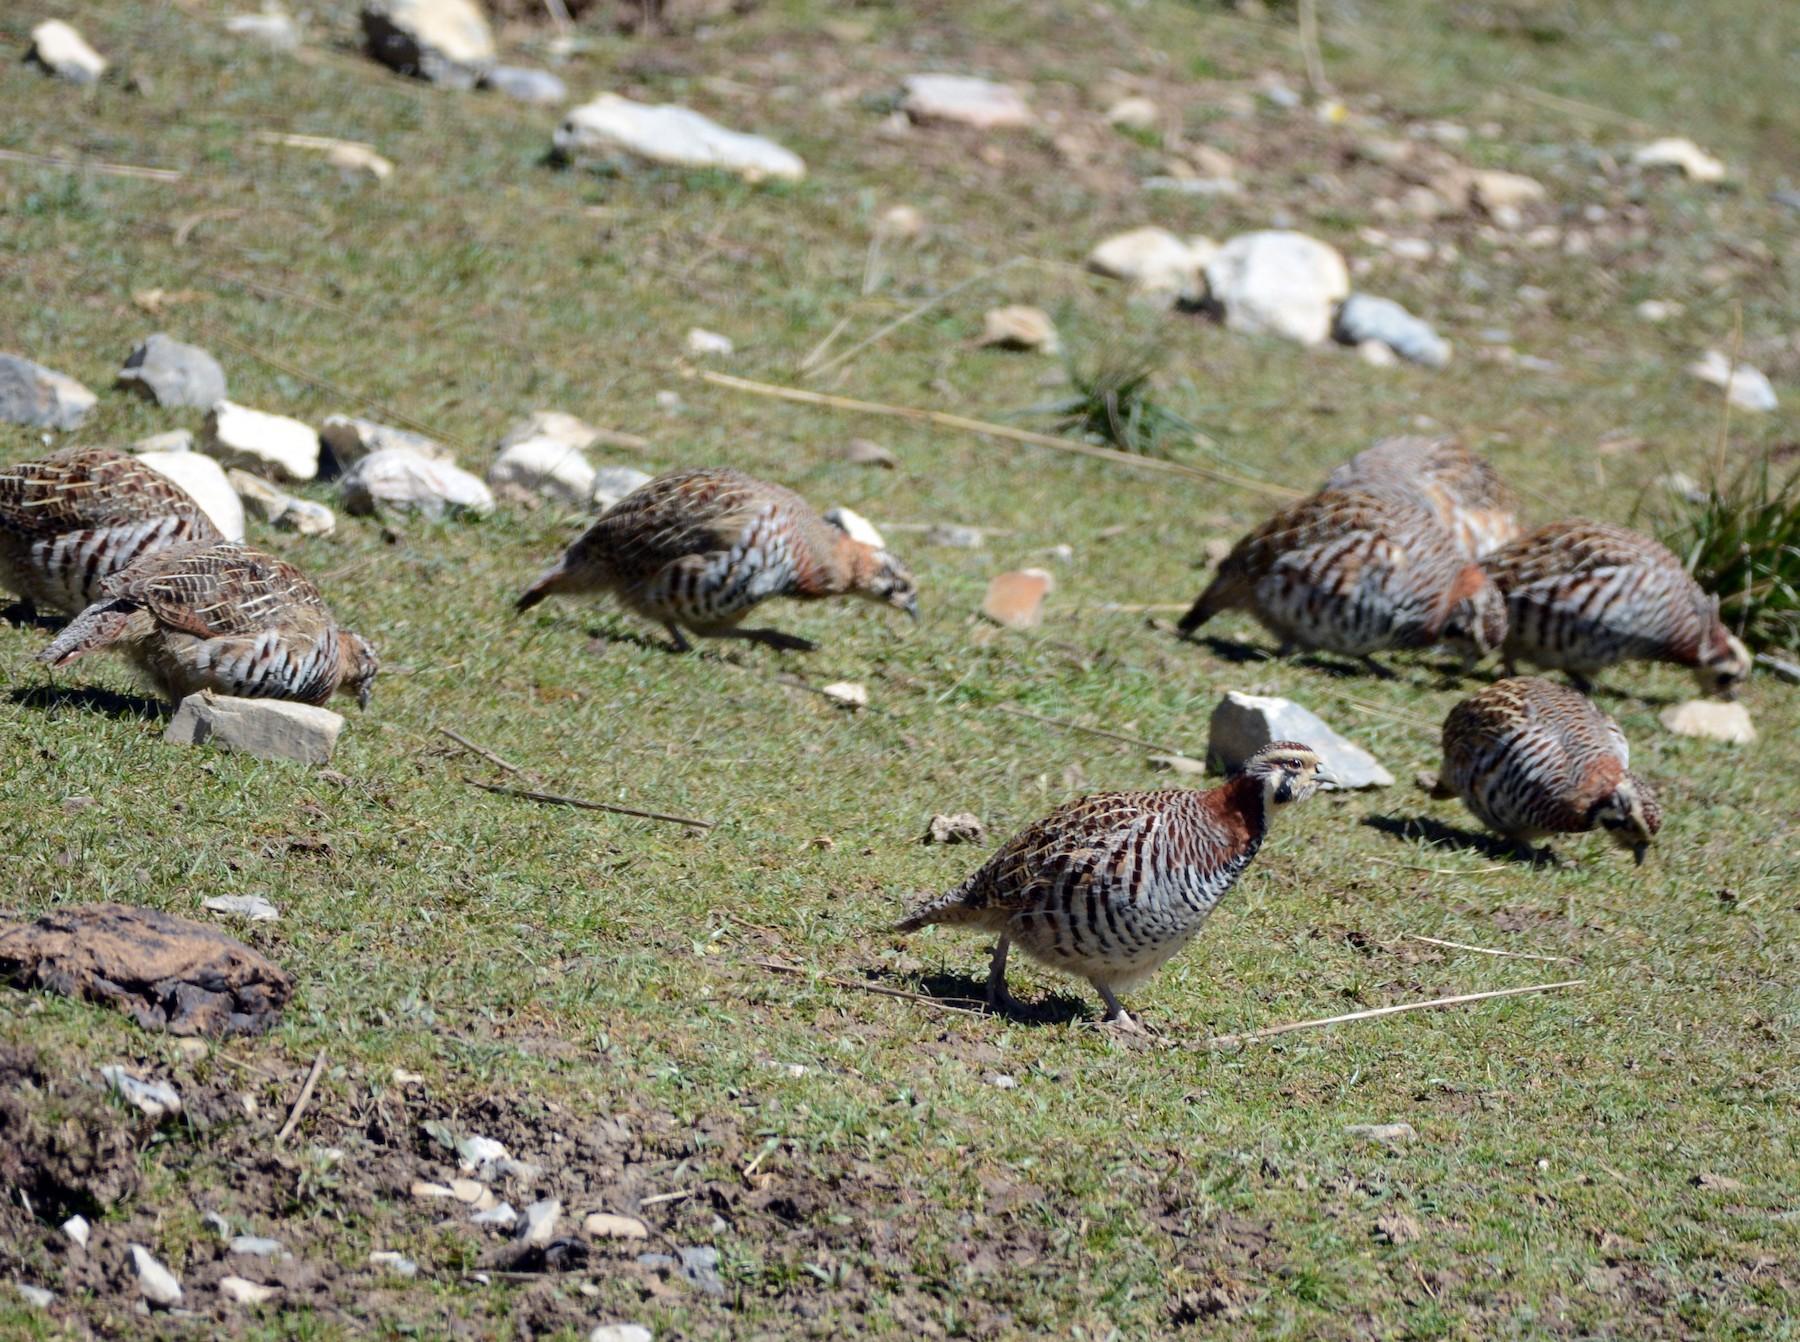 Tibetan Partridge - Cathy Pasterczyk